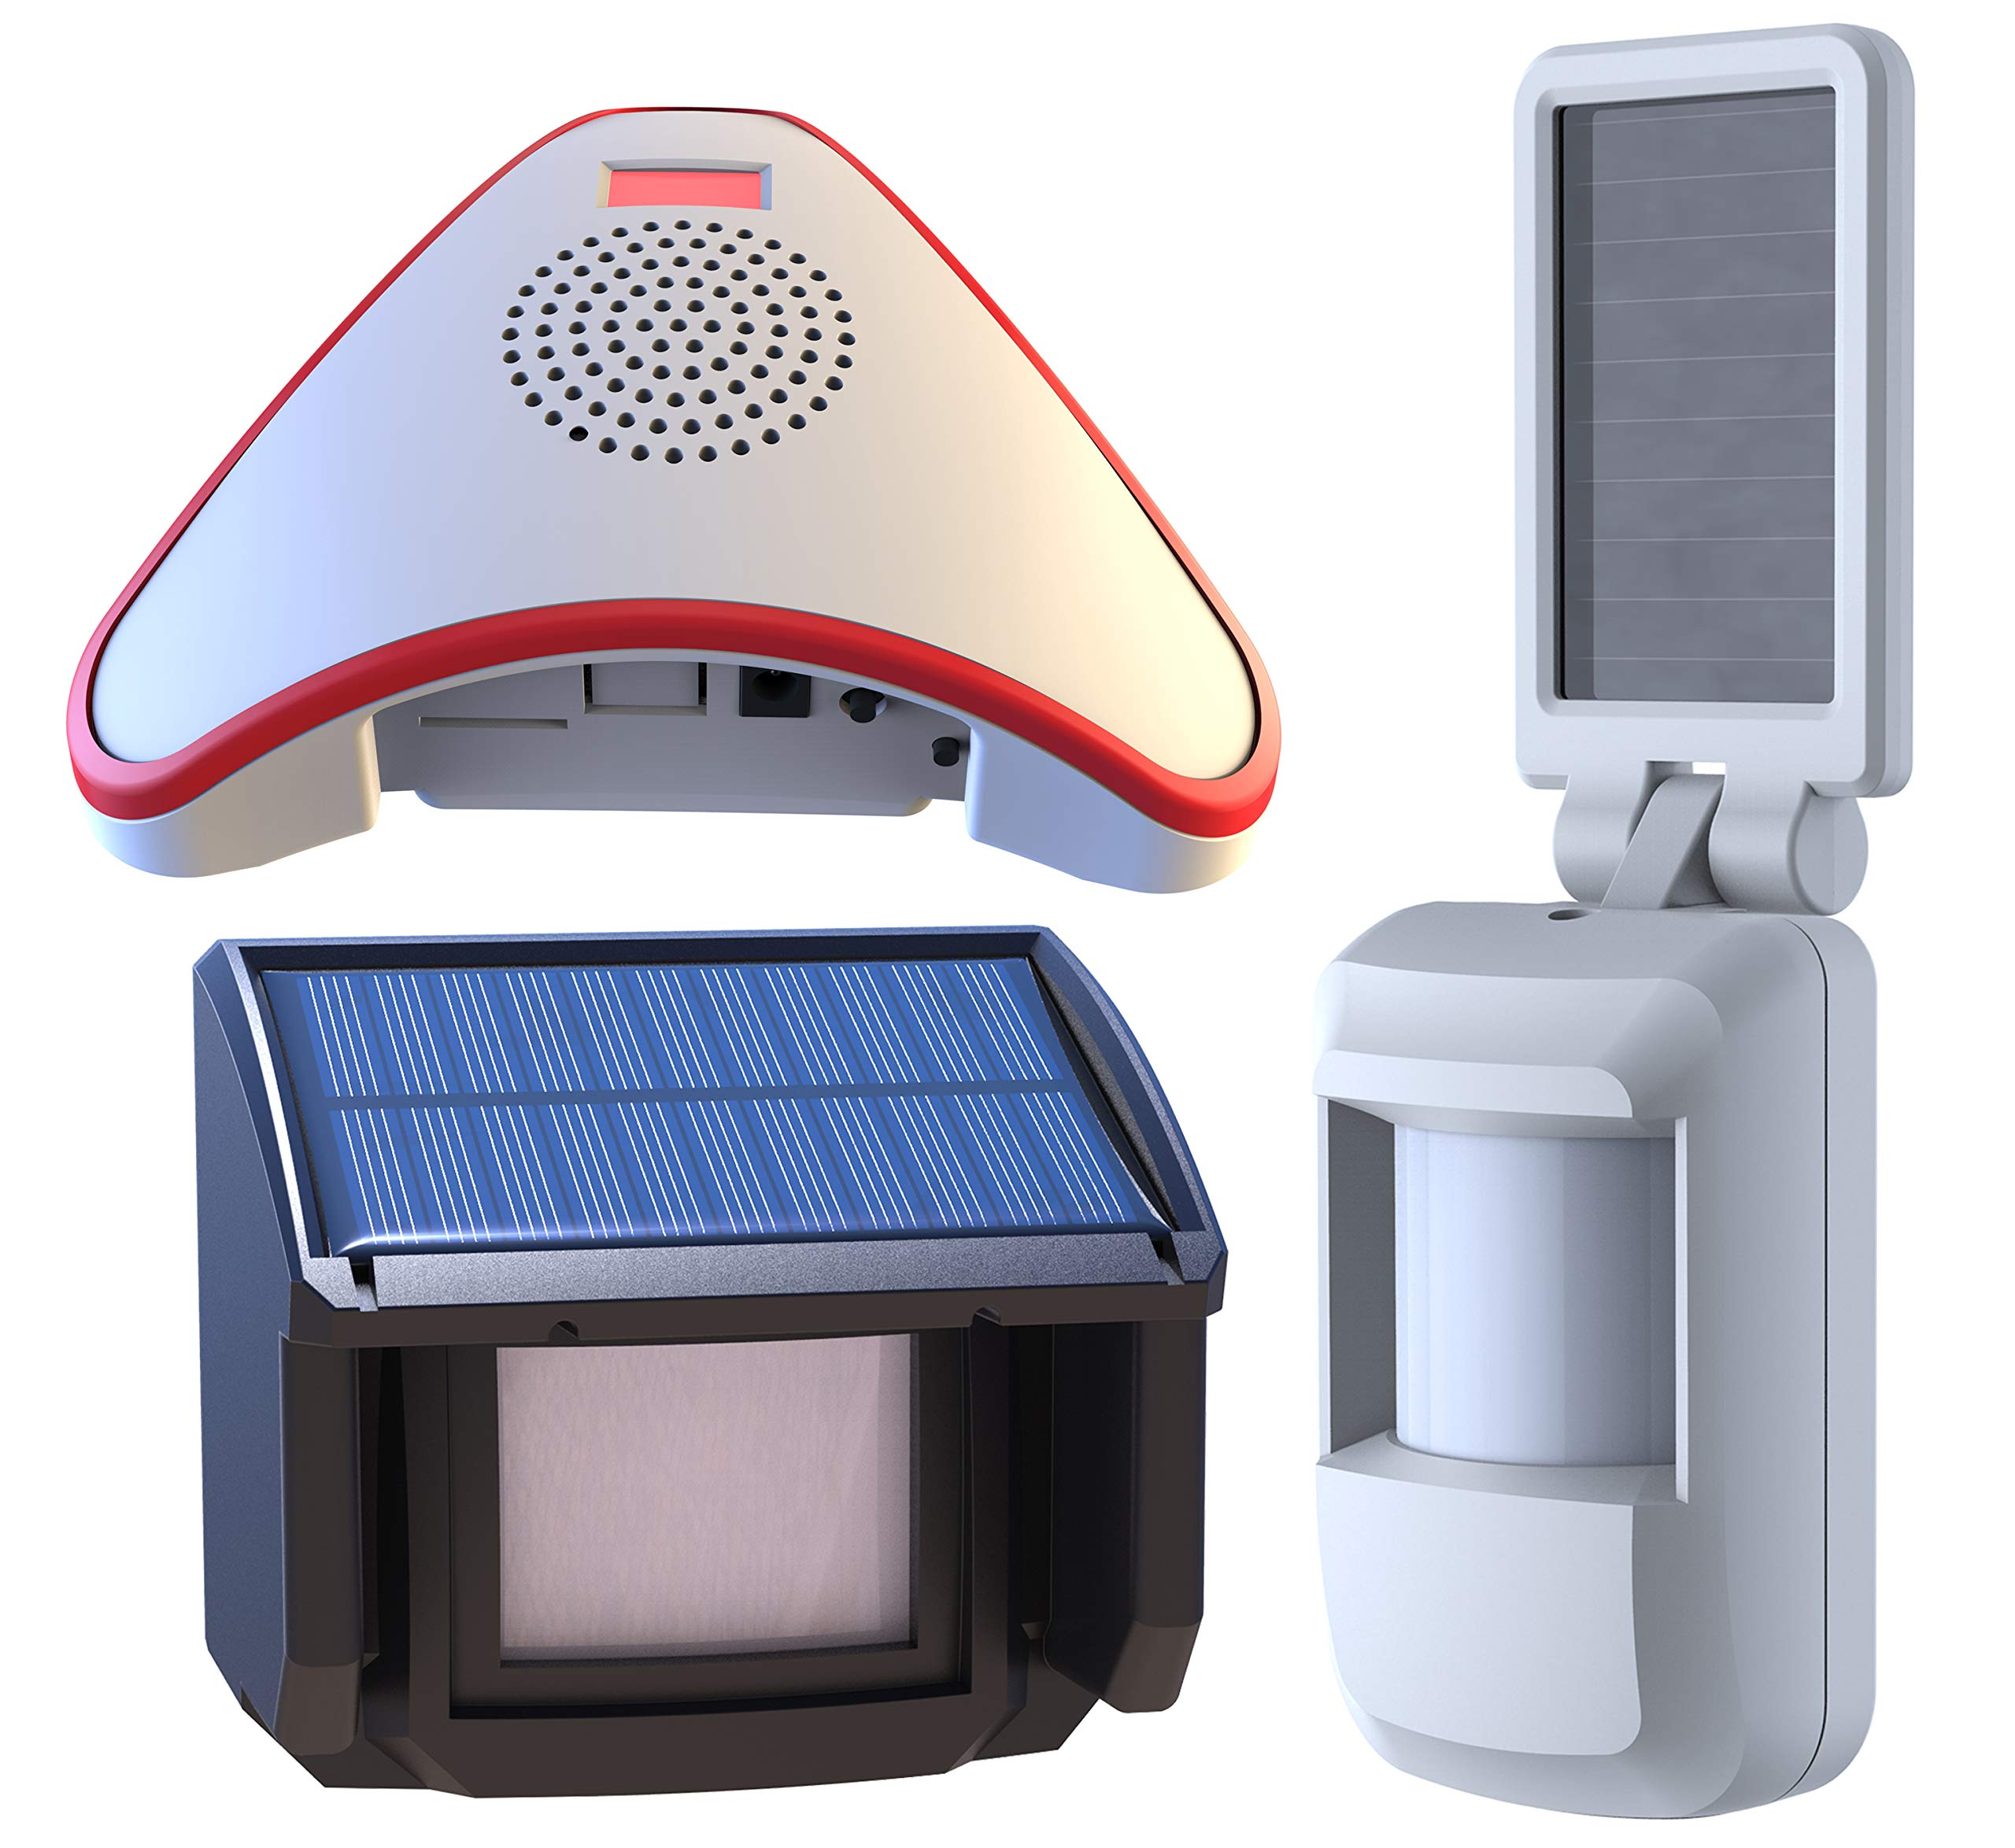 HTZSAFE Solar Wireless Driveway Alarm System-Includes 1 Alarm Receiver, 1 Outdoor Motion Sensor, 1 Indoor Motion Sensor-Solar Powered No Need Replace Batteries-1/4 Mile Long Transmission Range